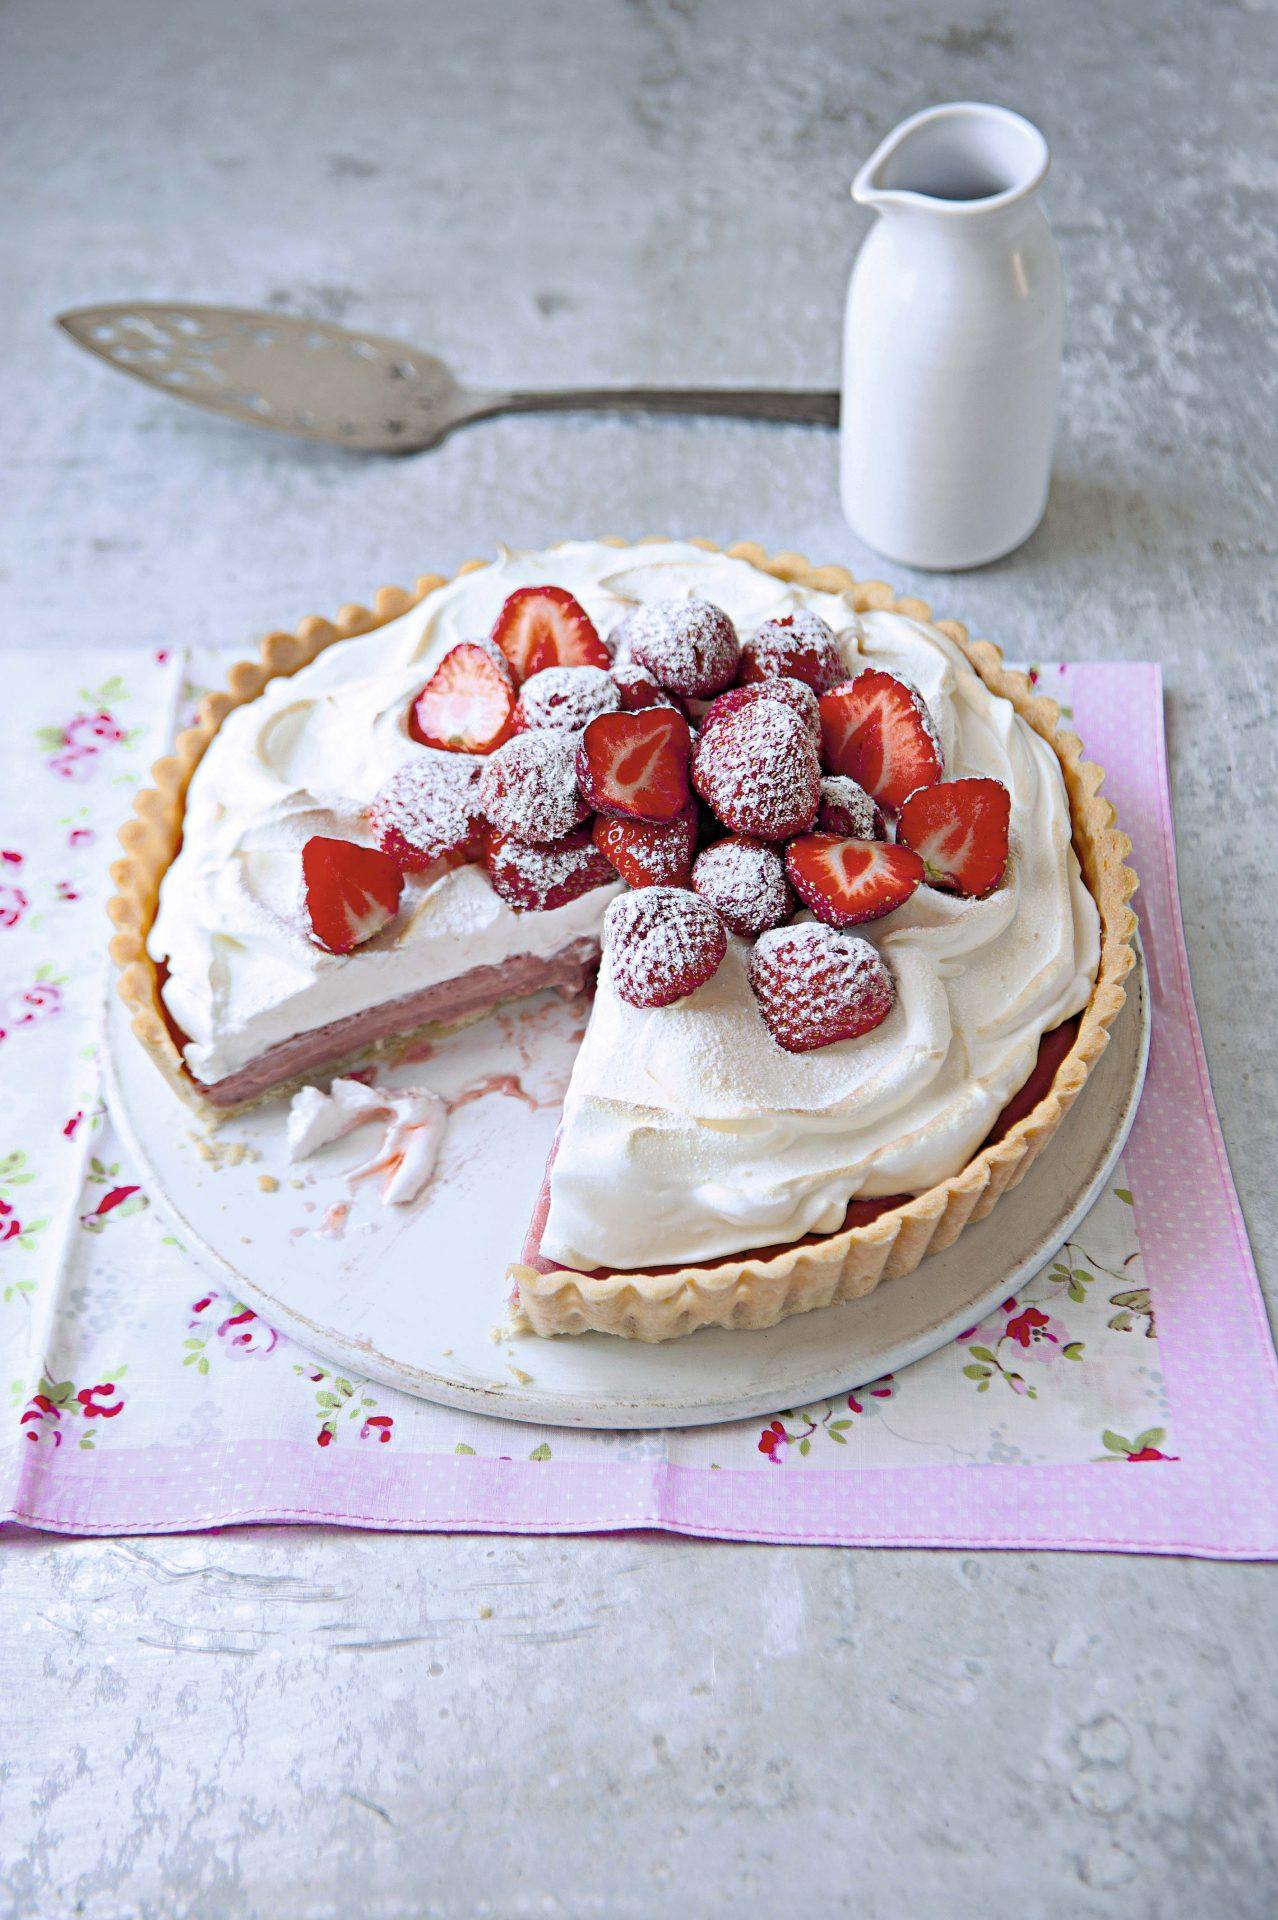 Tarta de fresas y merengue